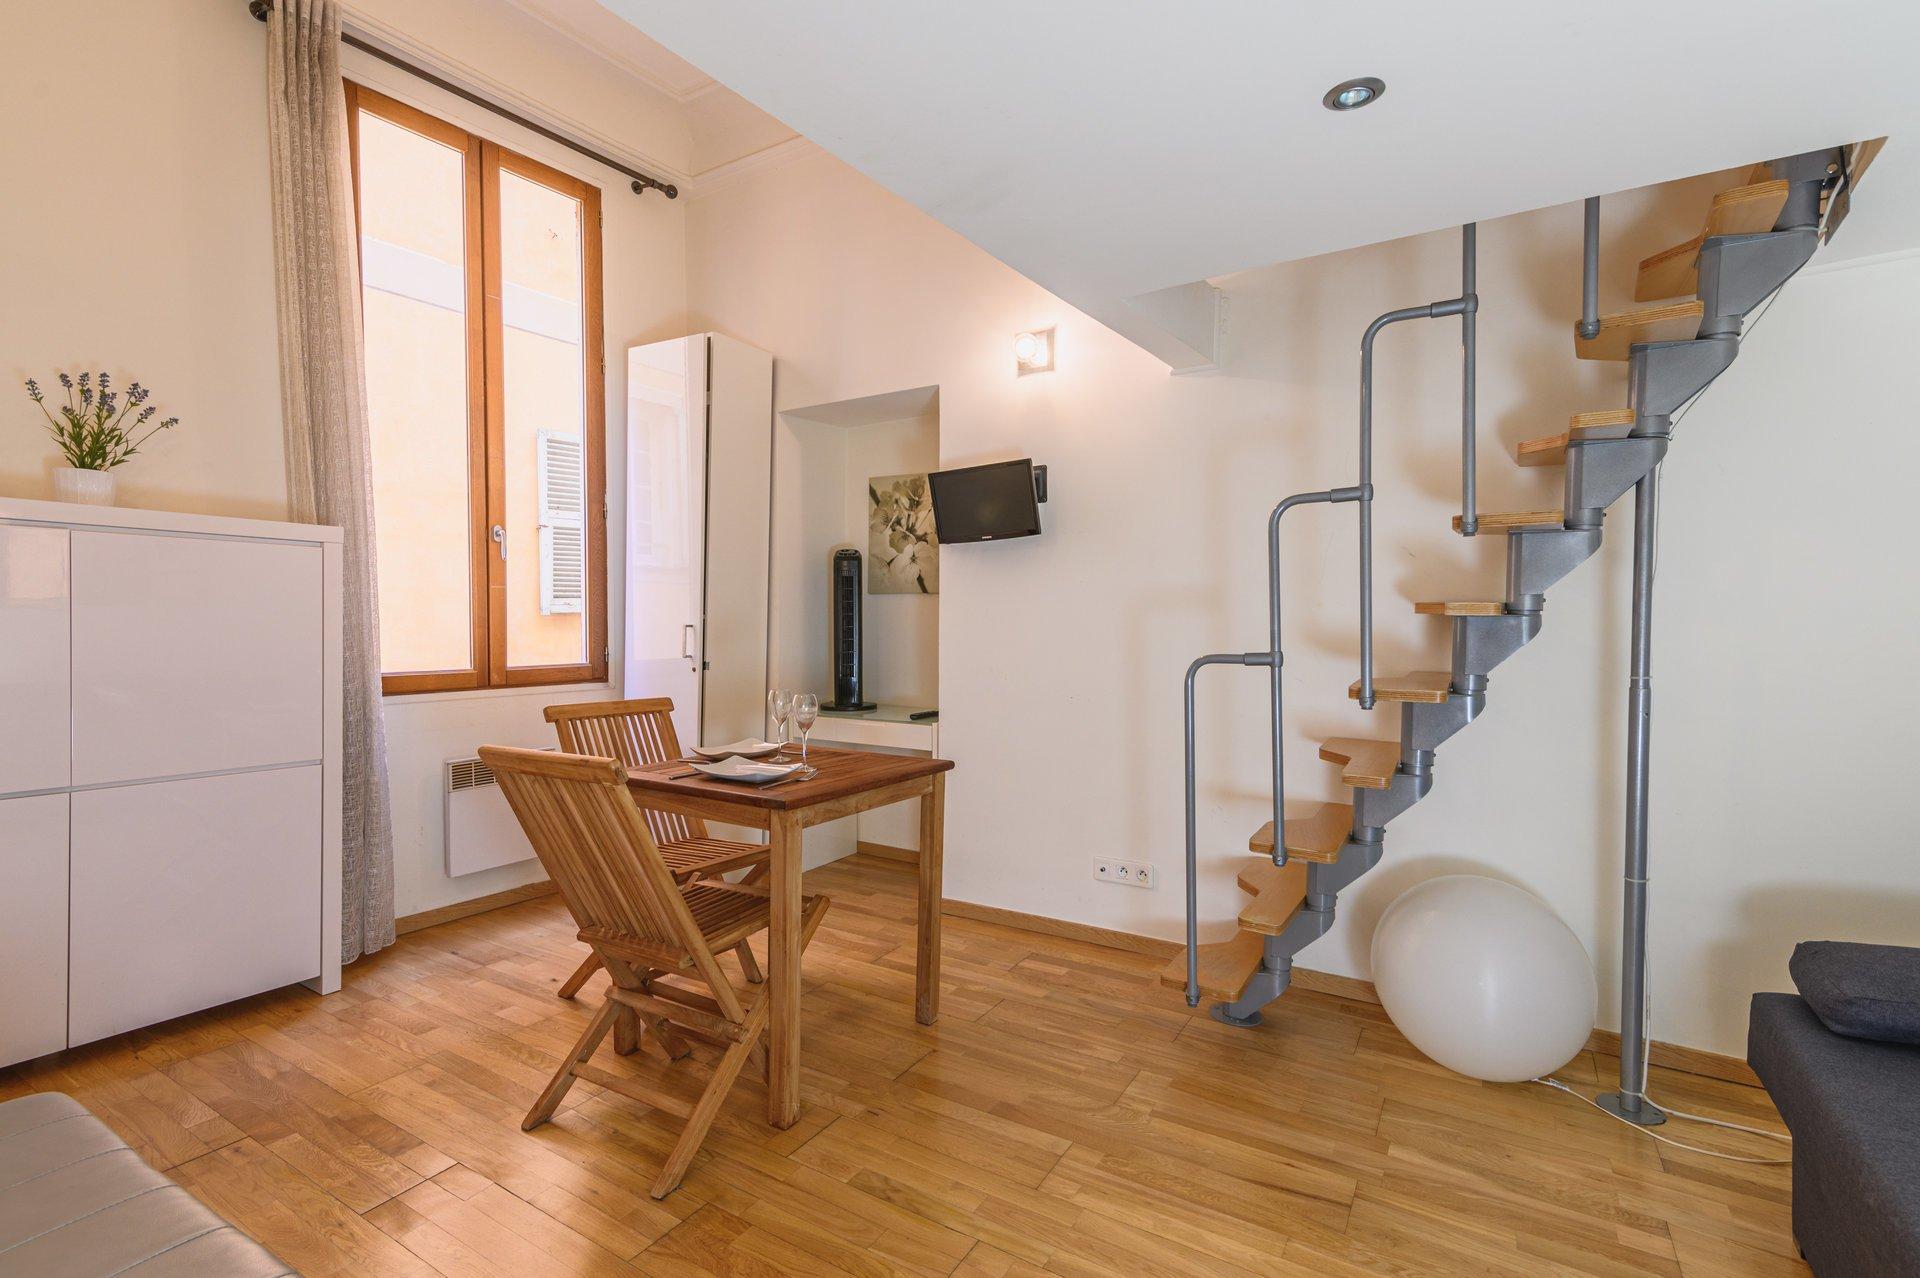 Vieux-Nice - Studio avec mezzanine